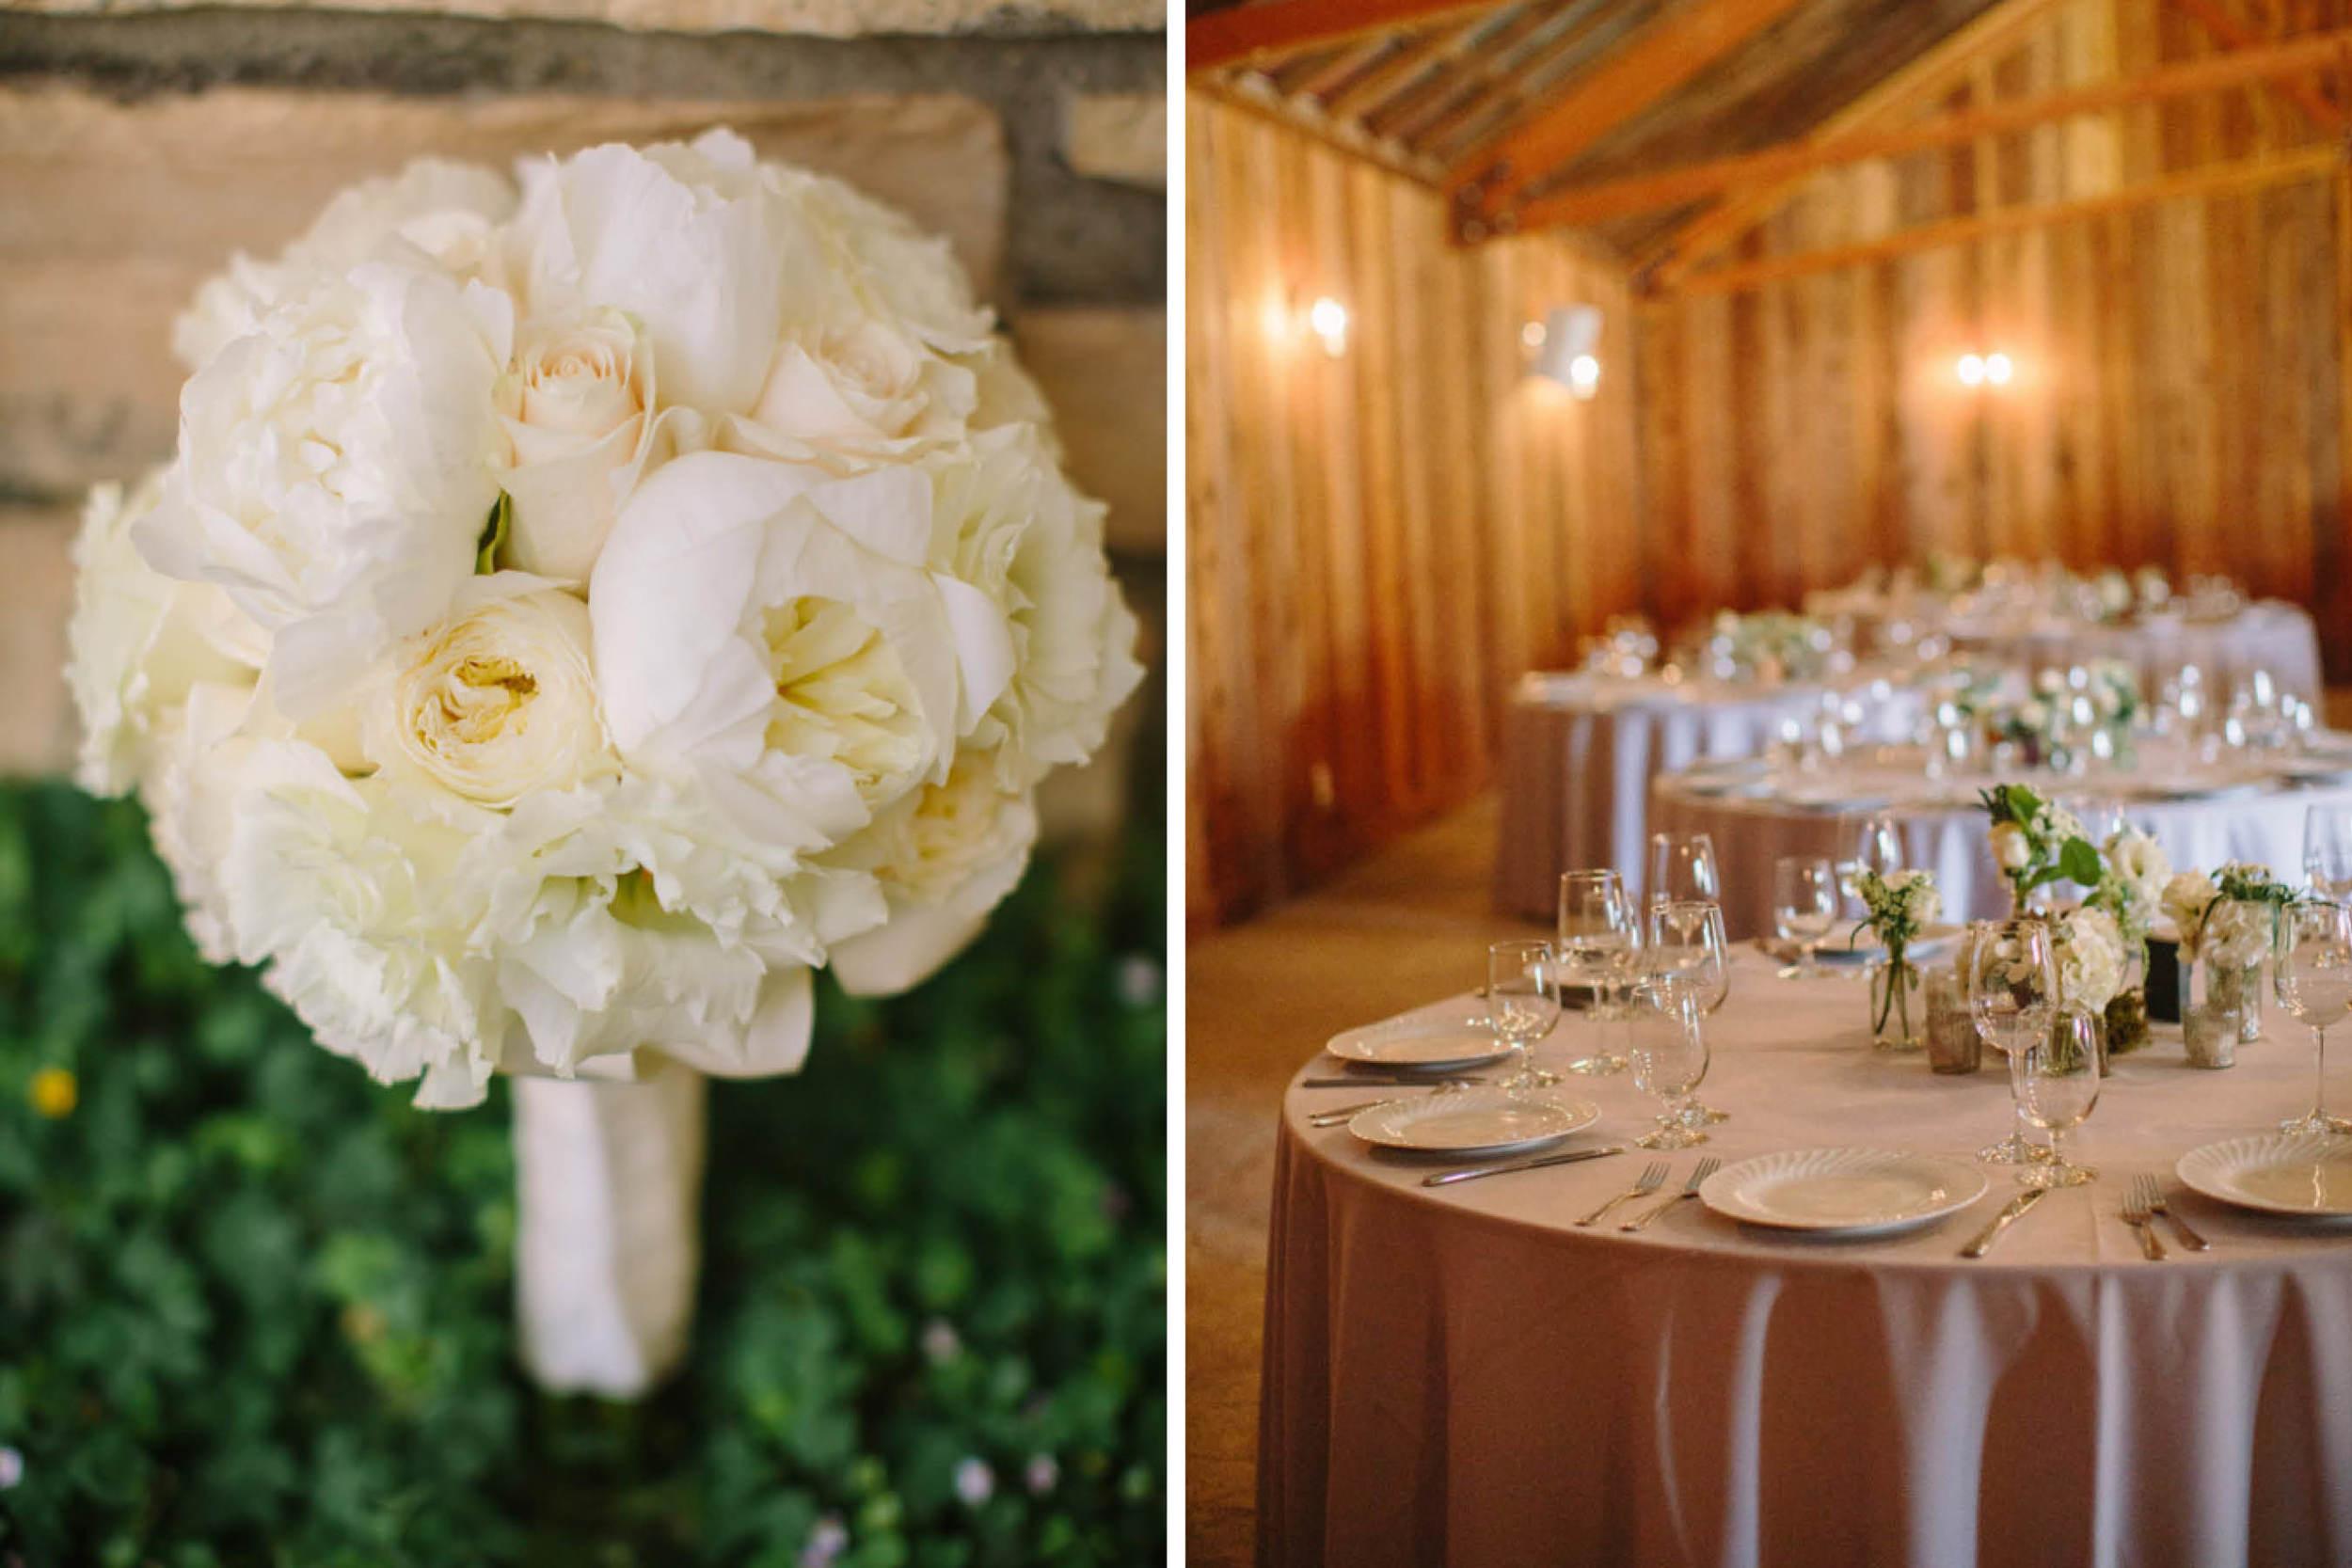 alegria-by-design-tres-hermanas-winery-vineyard-wedding-planner-coordinator-santa-barbara-ynez-maria (9).jpg